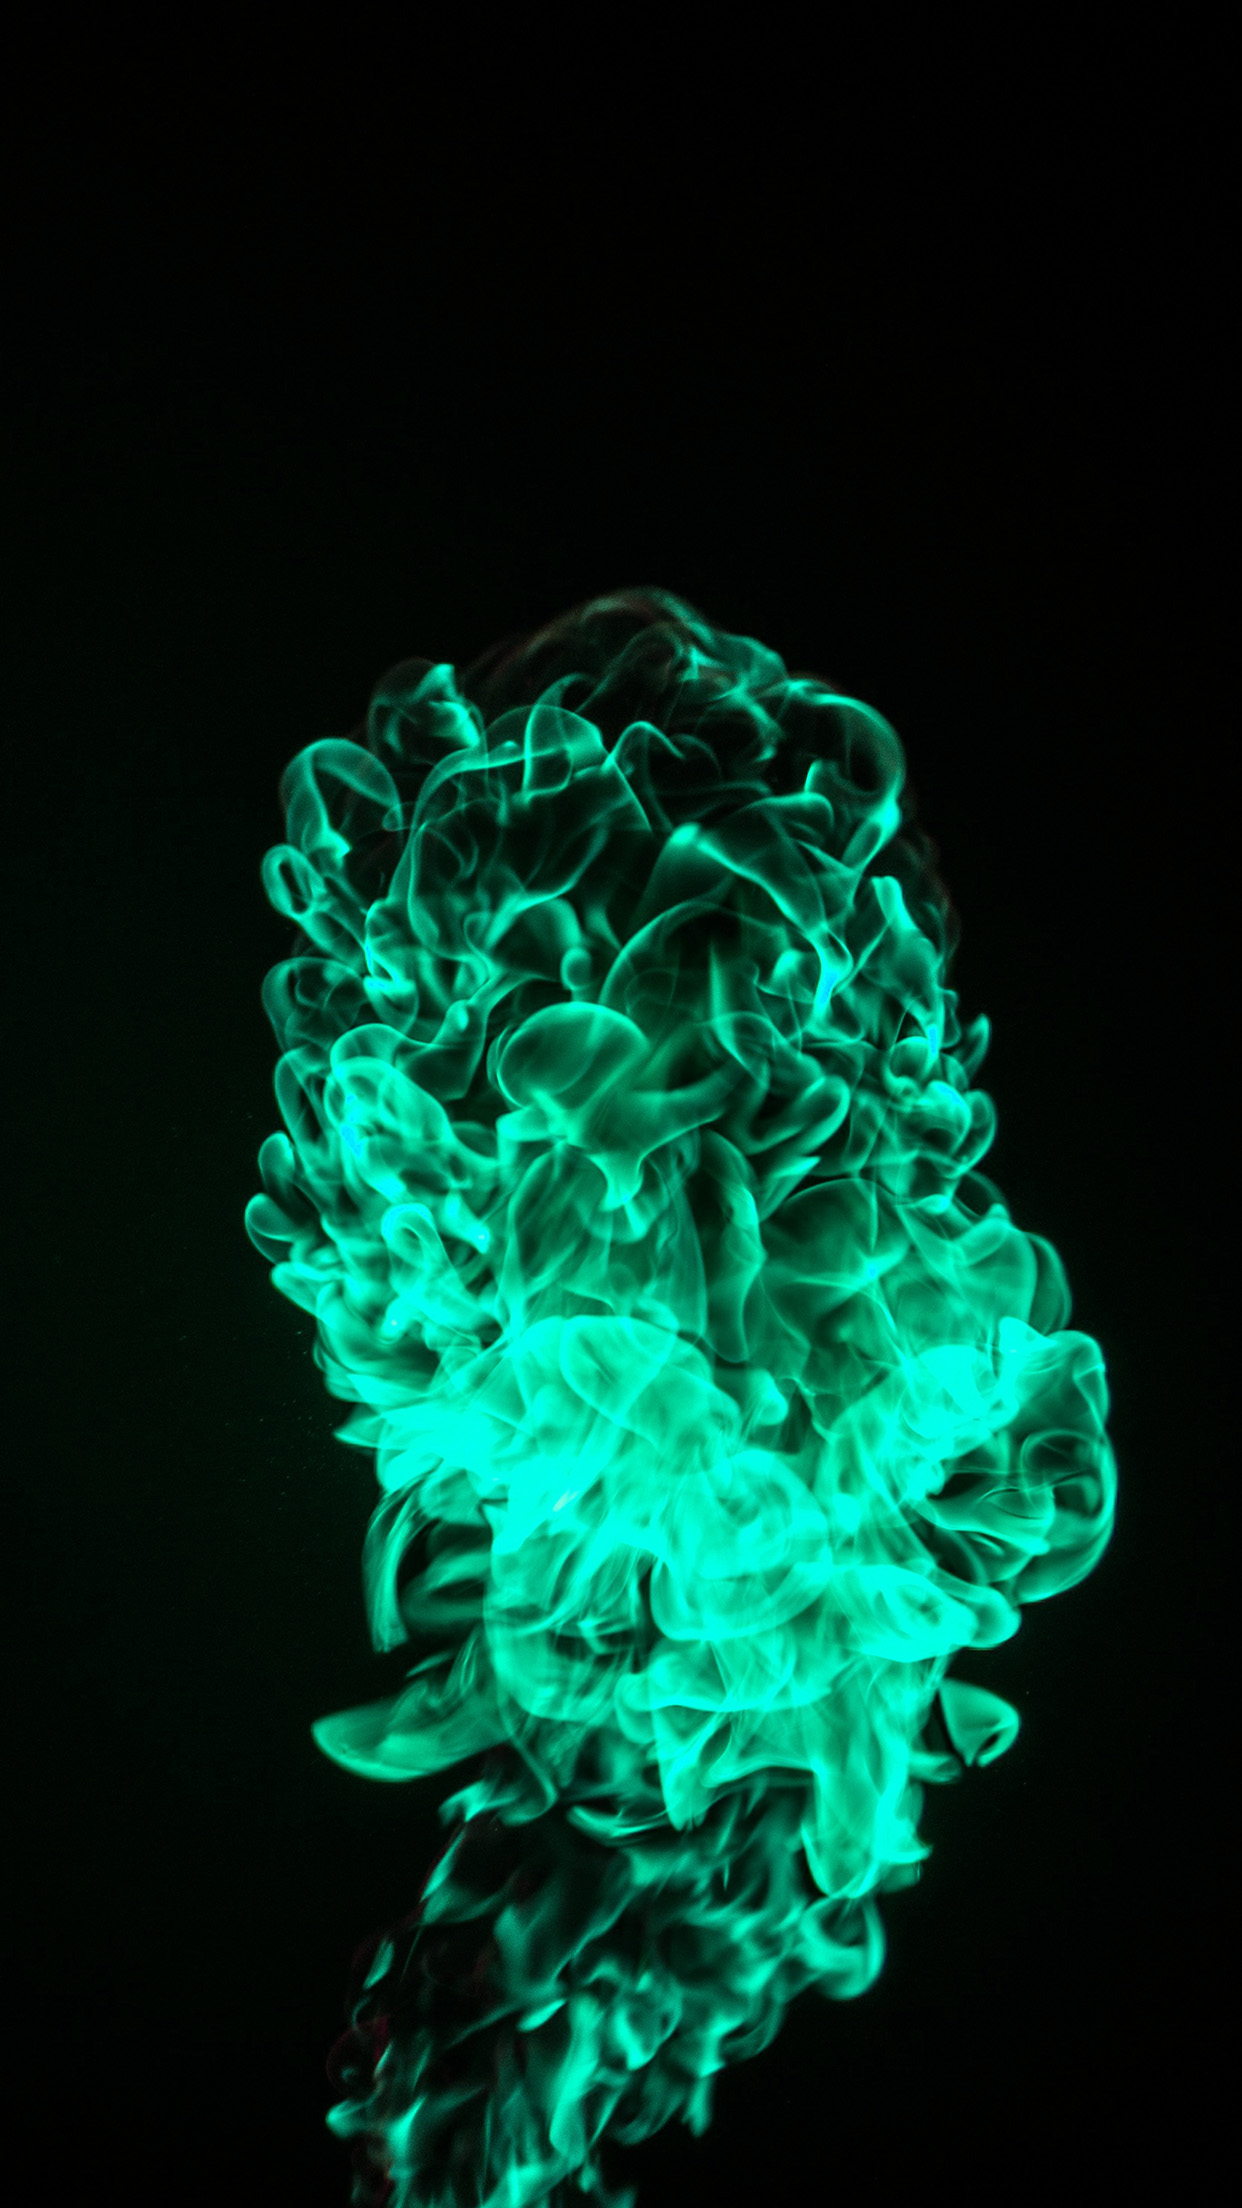 Iphonexpapers Com Iphone X Wallpaper Vp00 Fire Green Dark Pattern